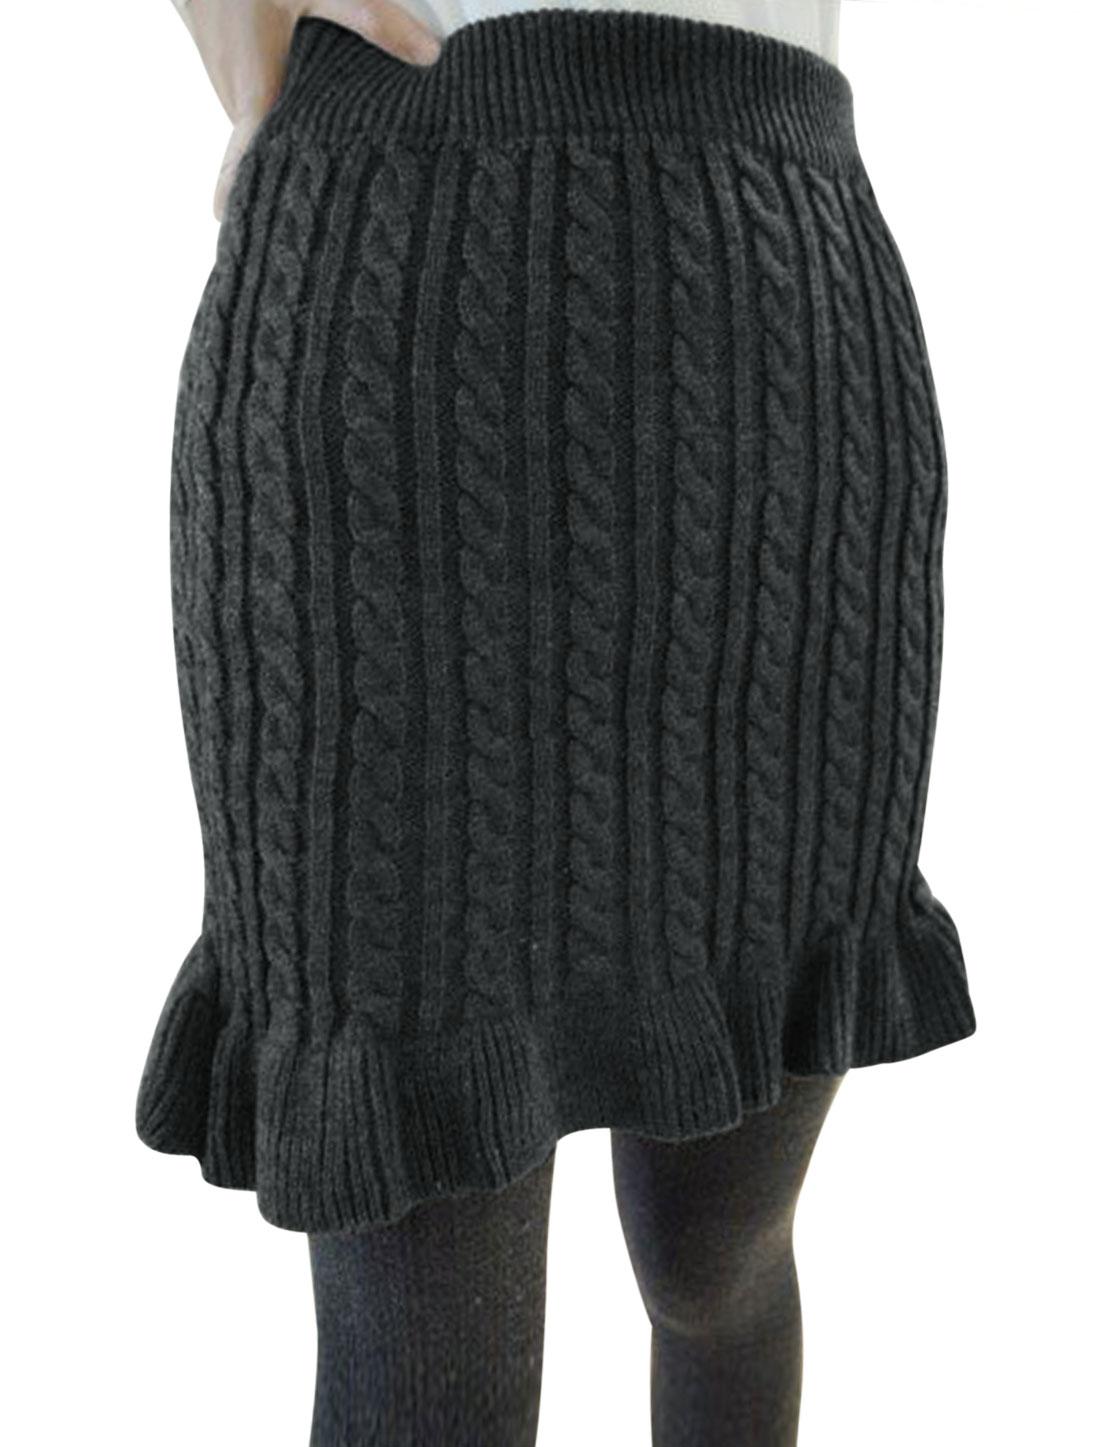 Women Cable Rib Knit Design Flouncing Hem Knitted Skirt Dark Gray XS